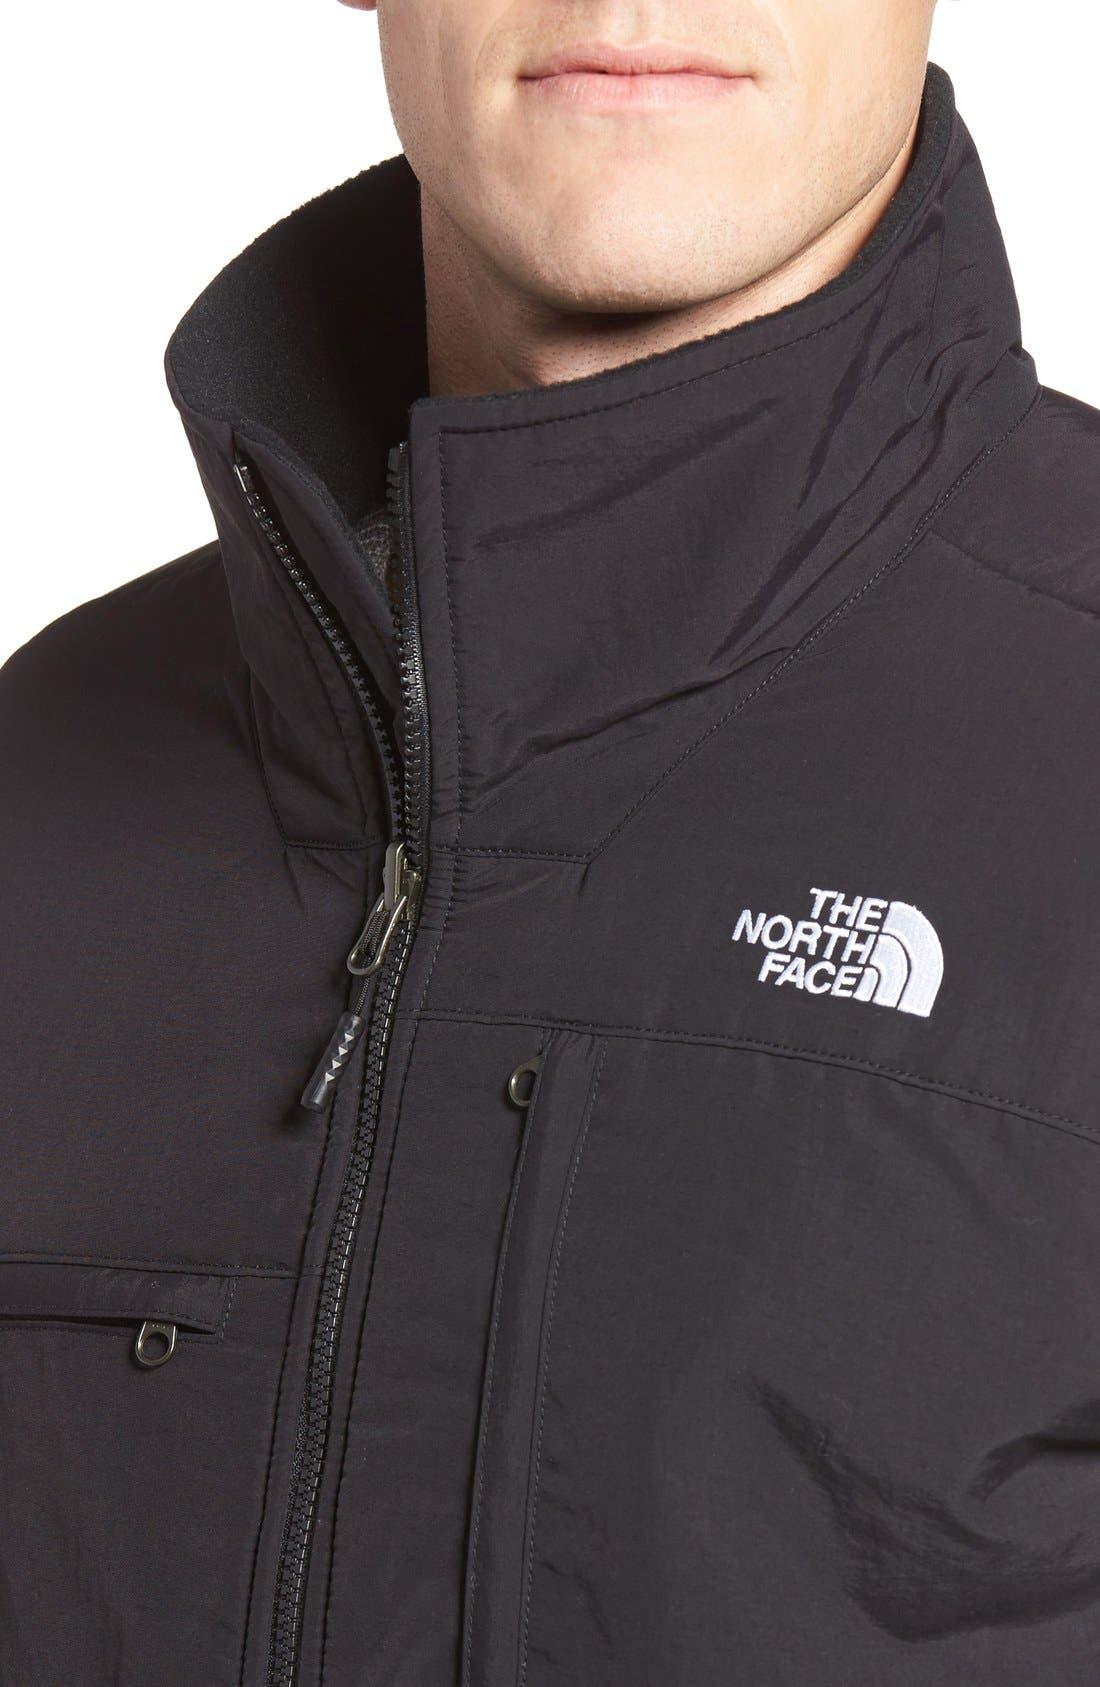 Denali 2 Recycled Fleece Jacket,                             Alternate thumbnail 10, color,                             001